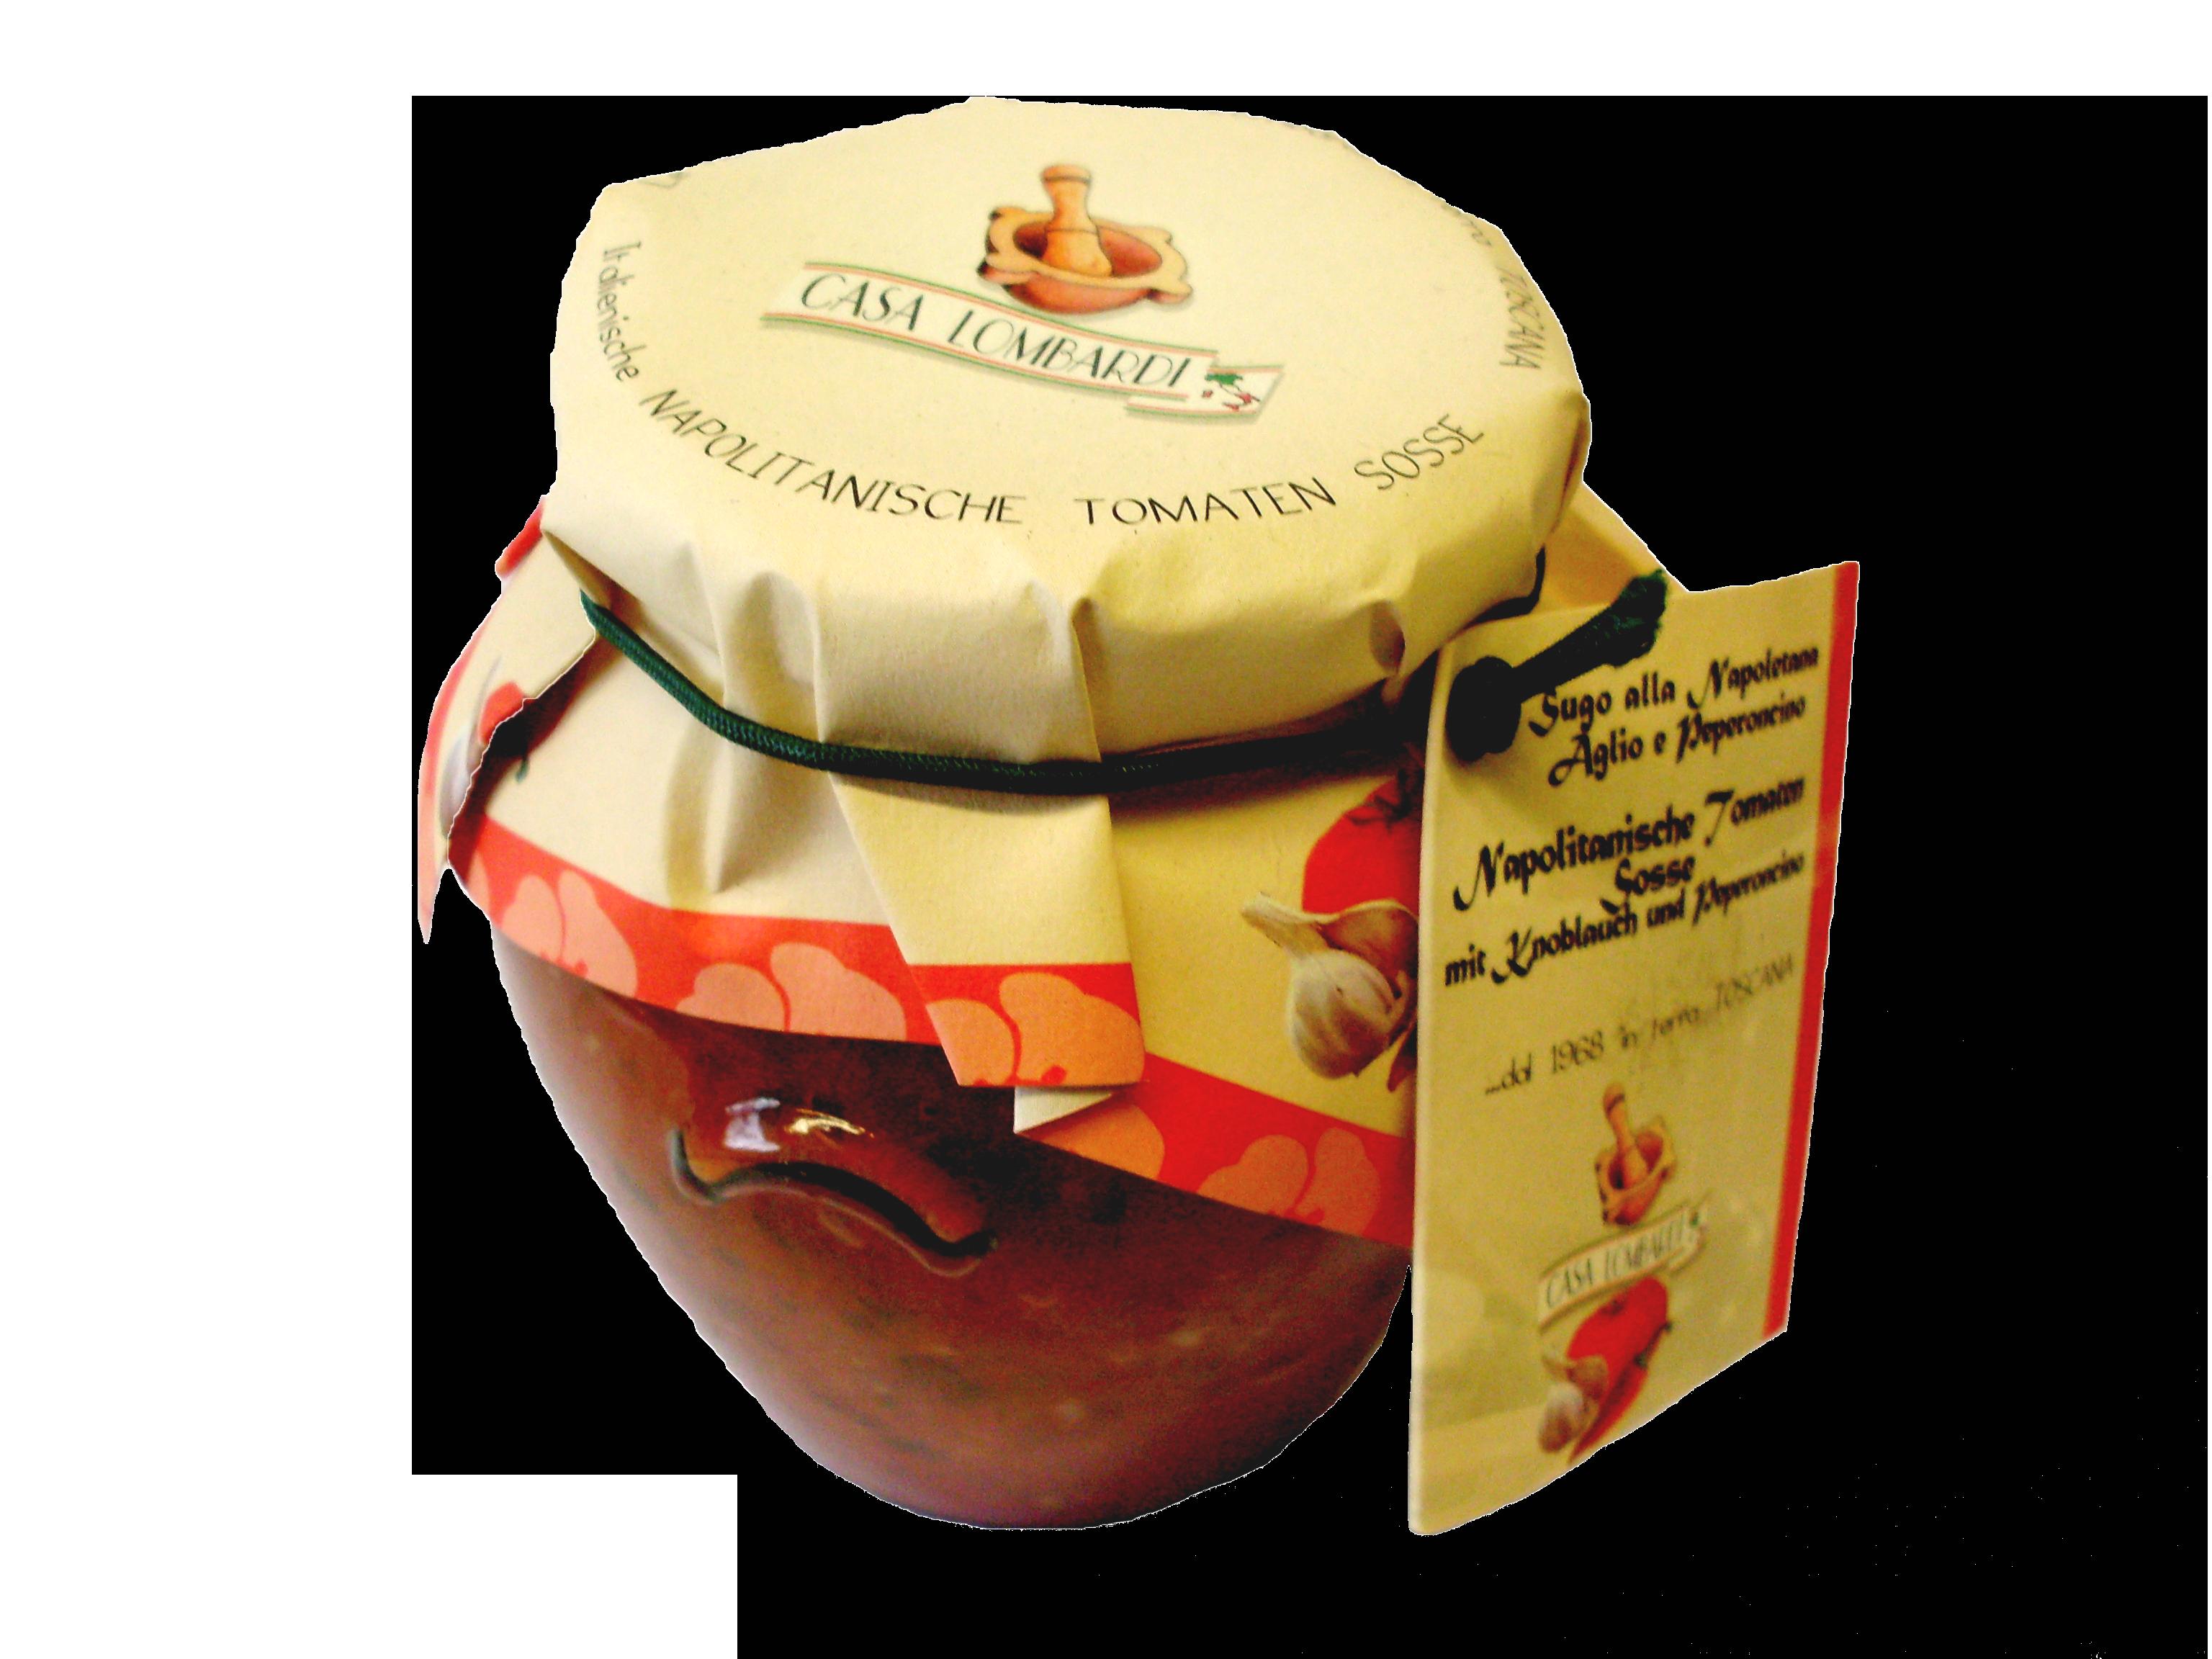 Crema Lombardi Napolitanische Tomatensauce 280g